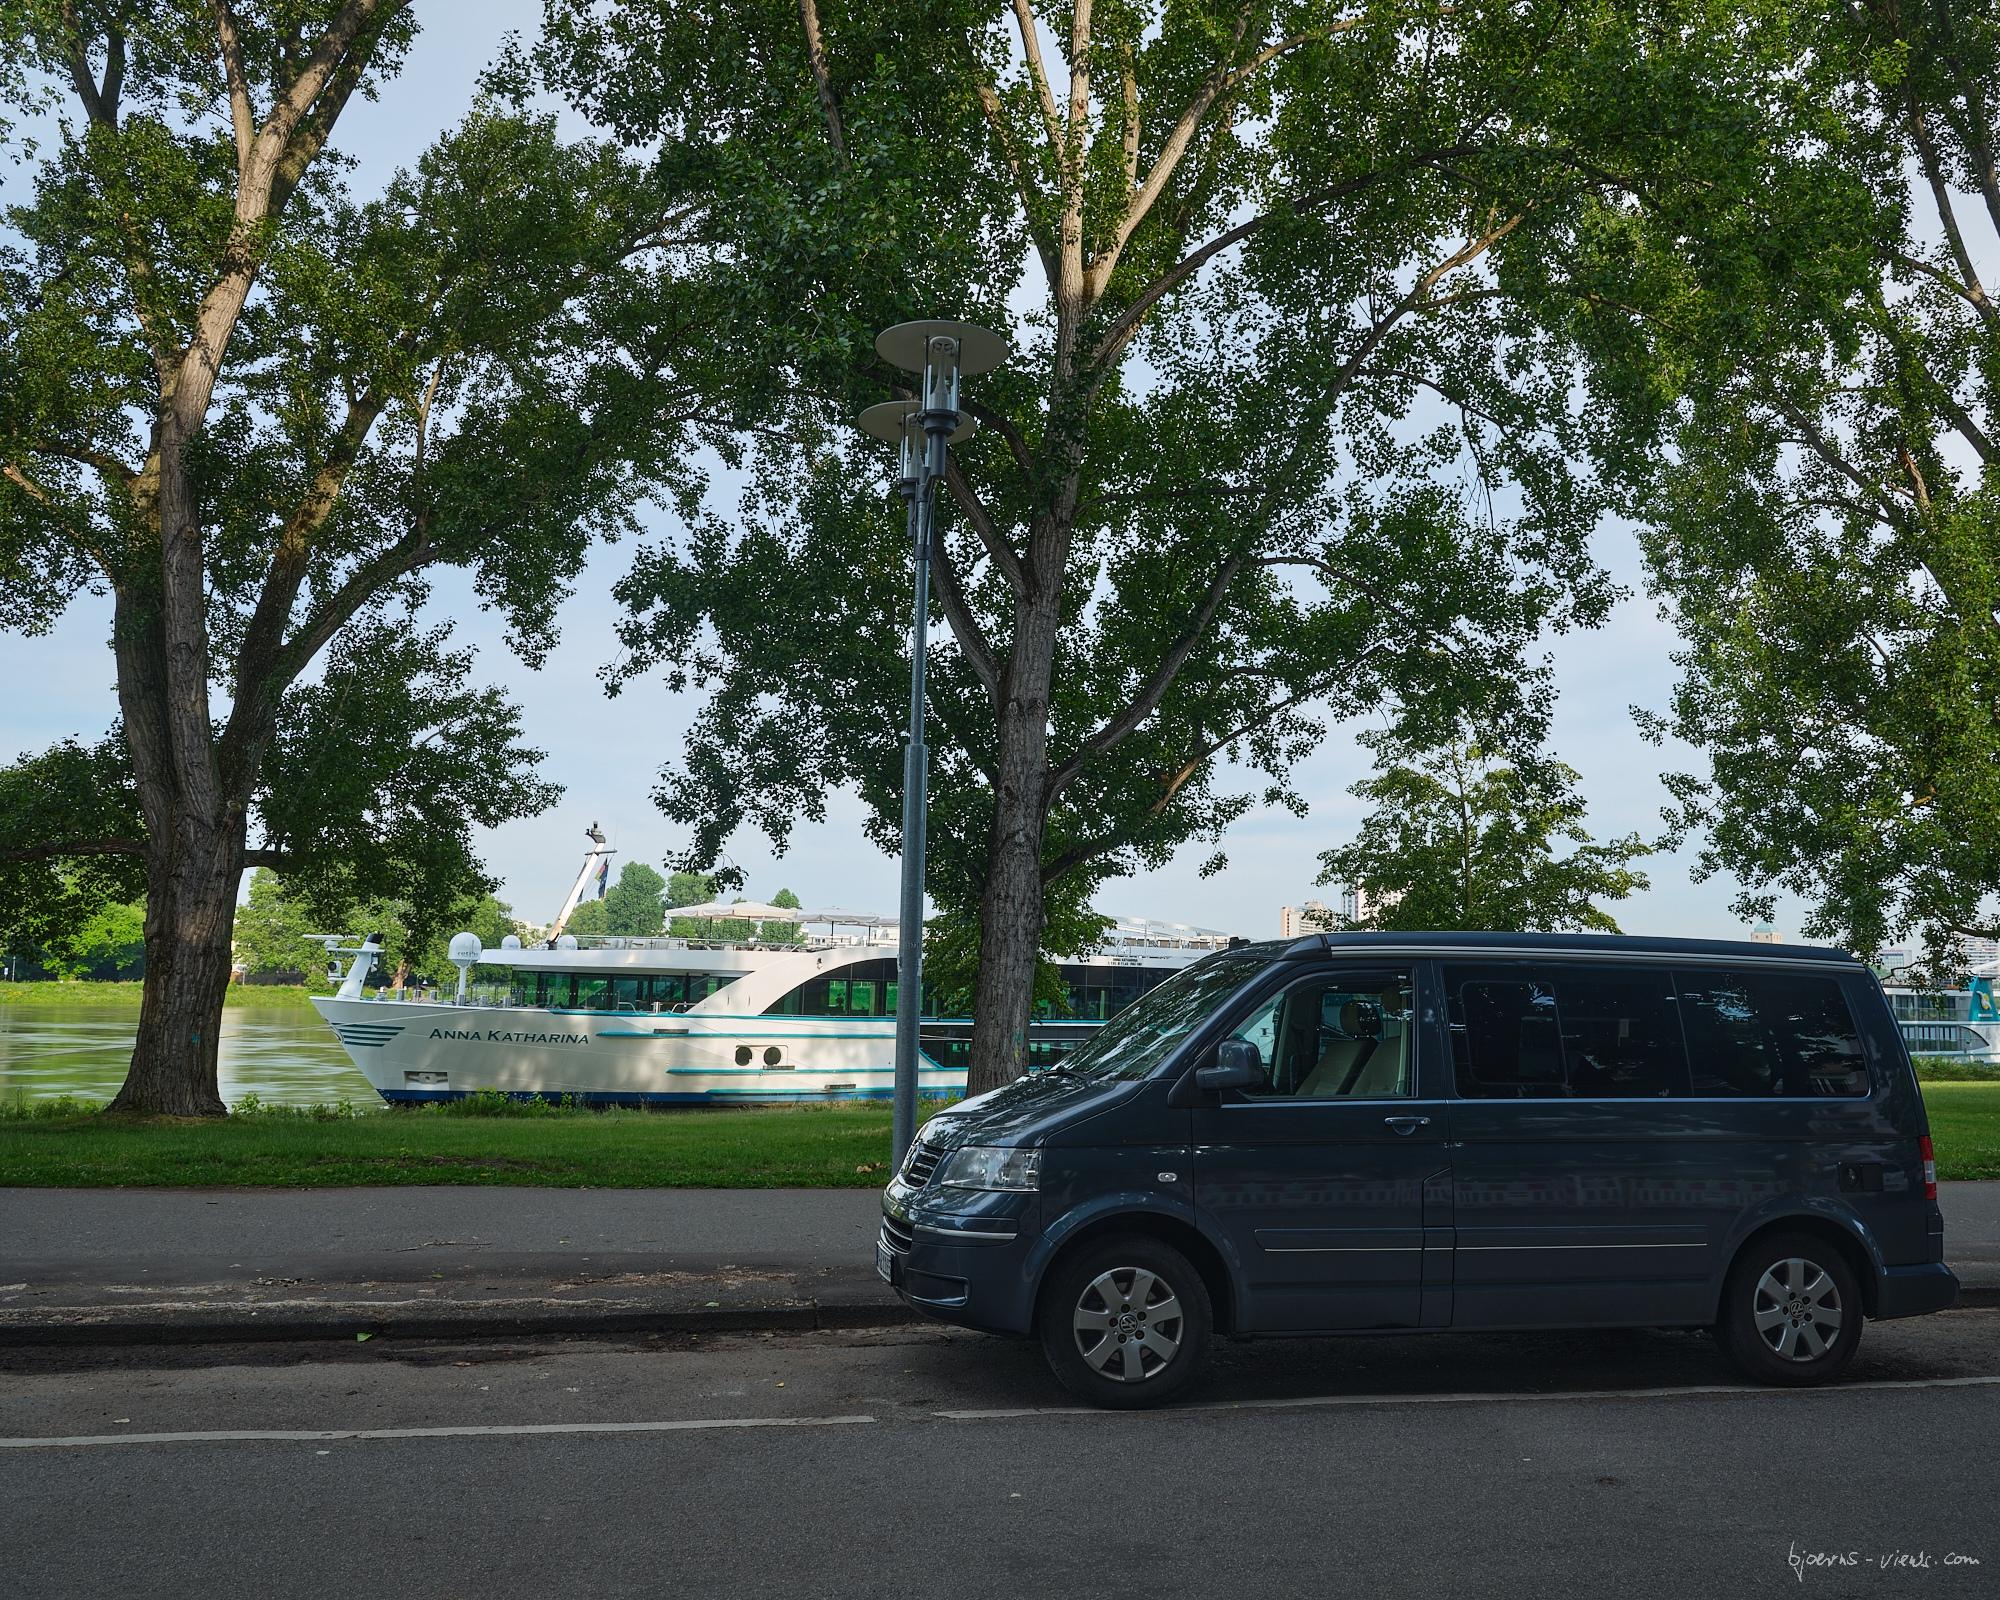 bjoernsviews, Fuji, capture one, bjoerns-views, bjoerns-views.com, Fujifilm, GFX, Mannheim, Konrad Adenauer Brücke, Schloss, Sonnenaufgang, Rhein, Jesuitenkirche